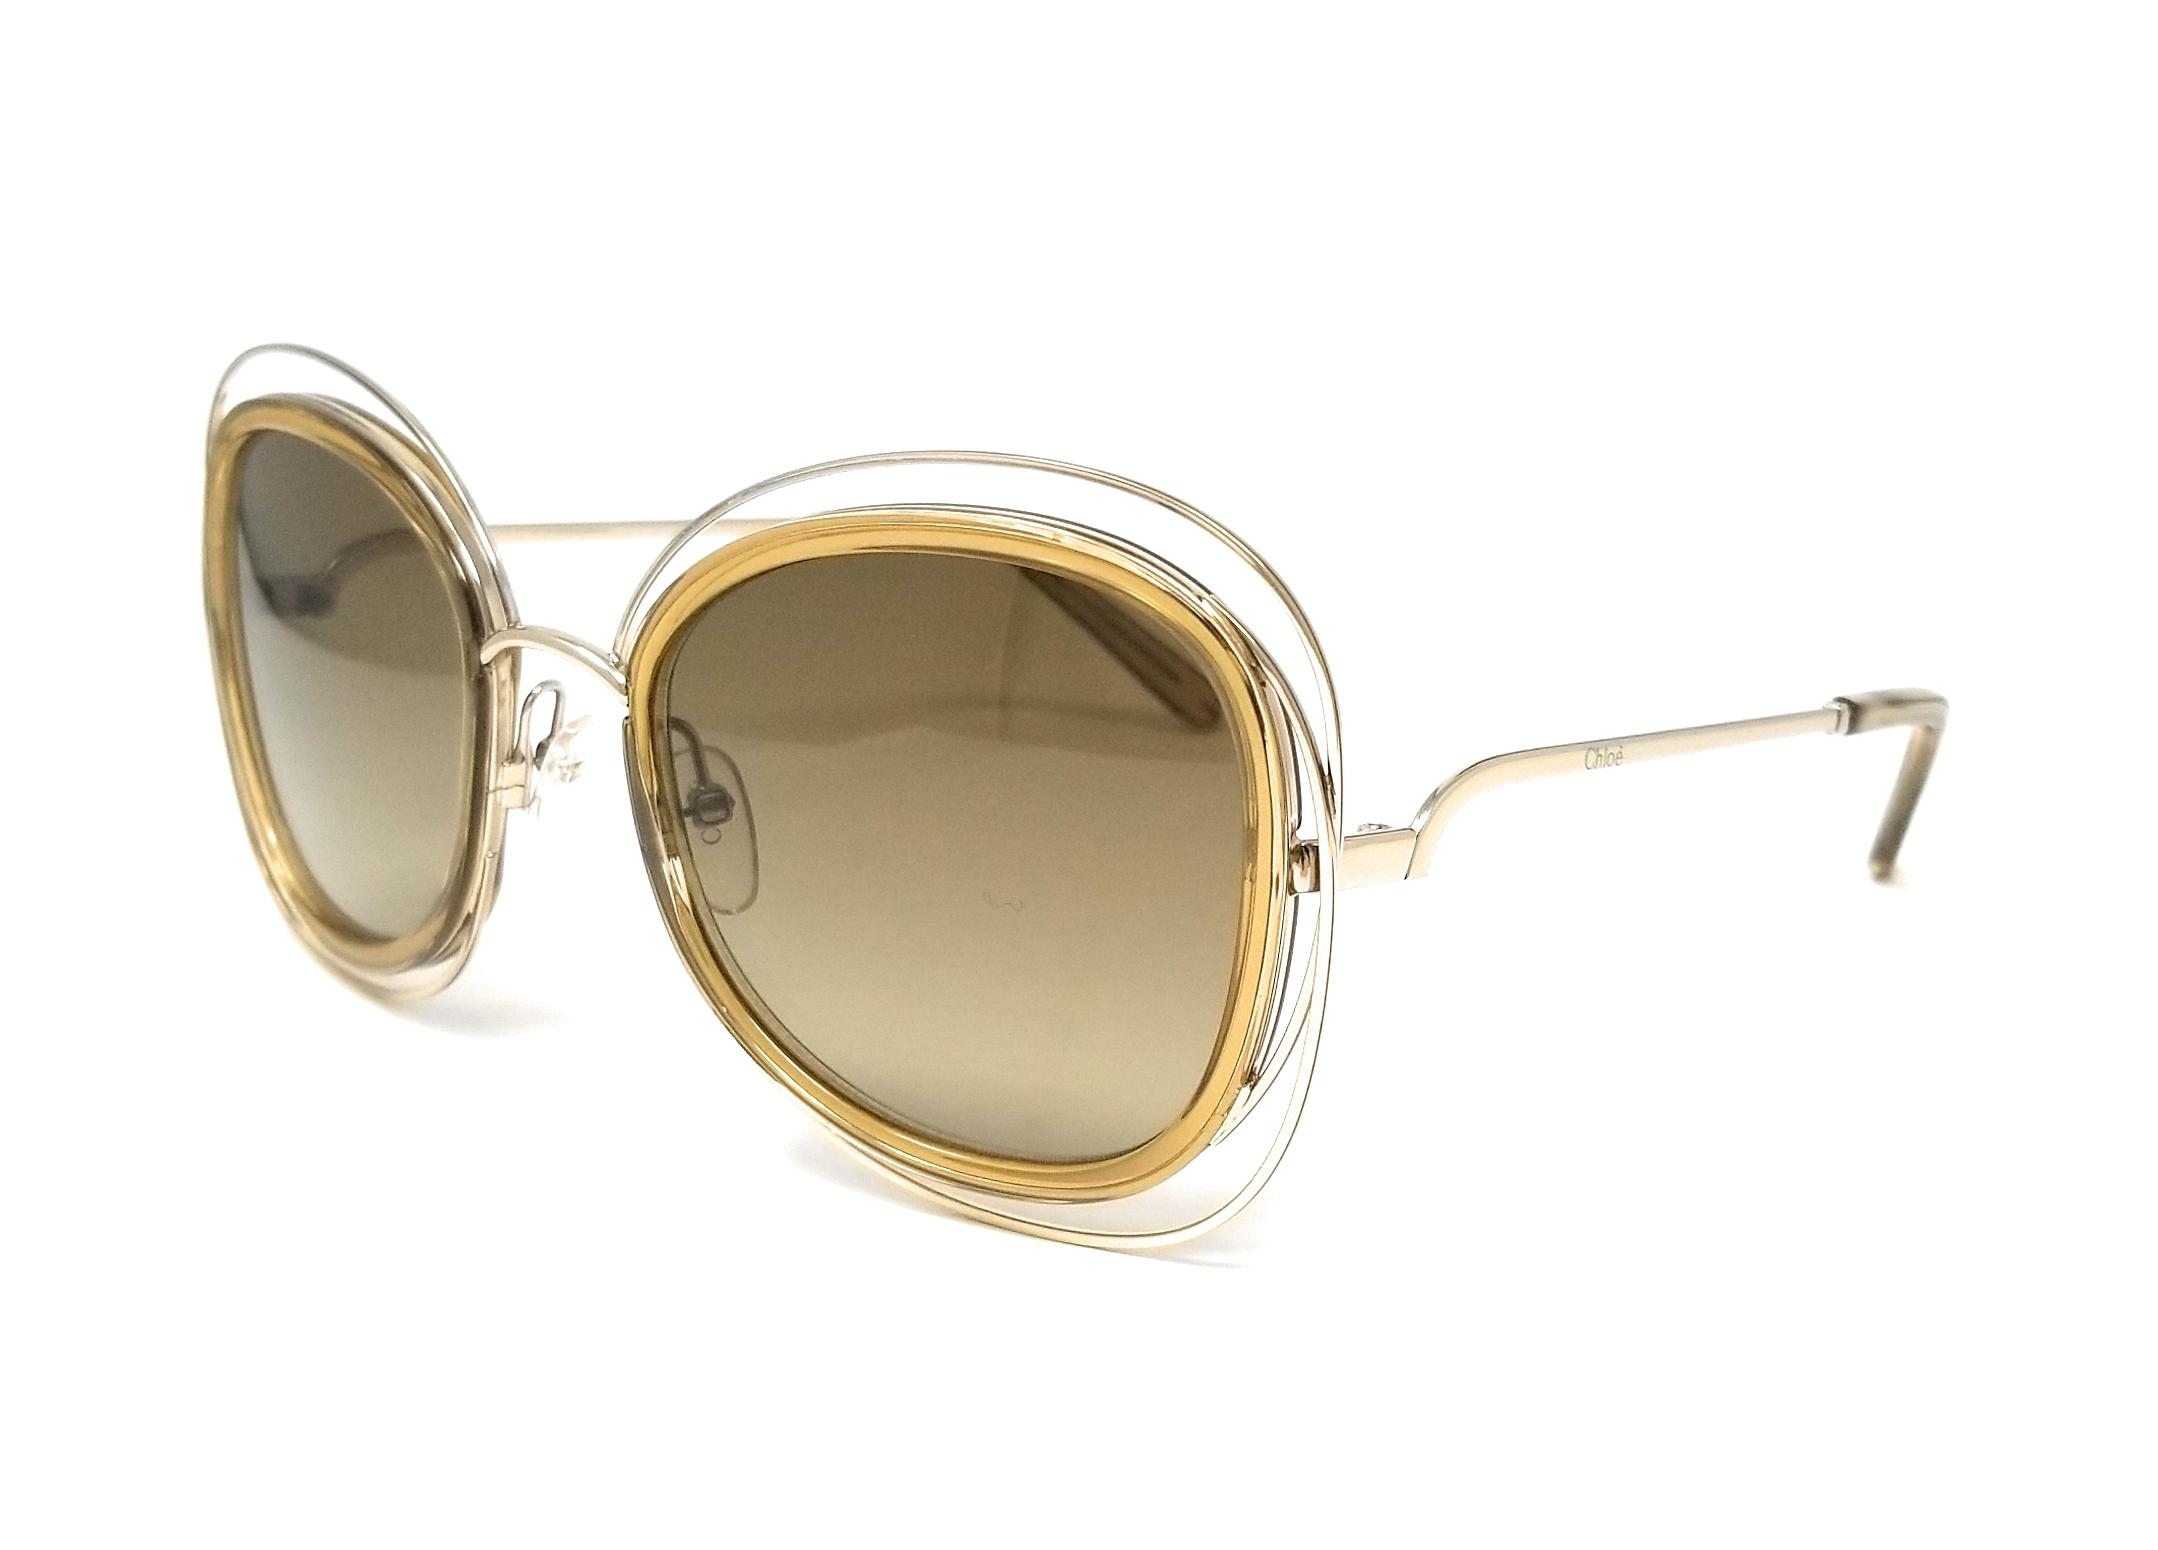 98b0a423986 Details about CHLOE Sunglasses CE123S 743 Light Gold Cat Eye Women s  56x23x135